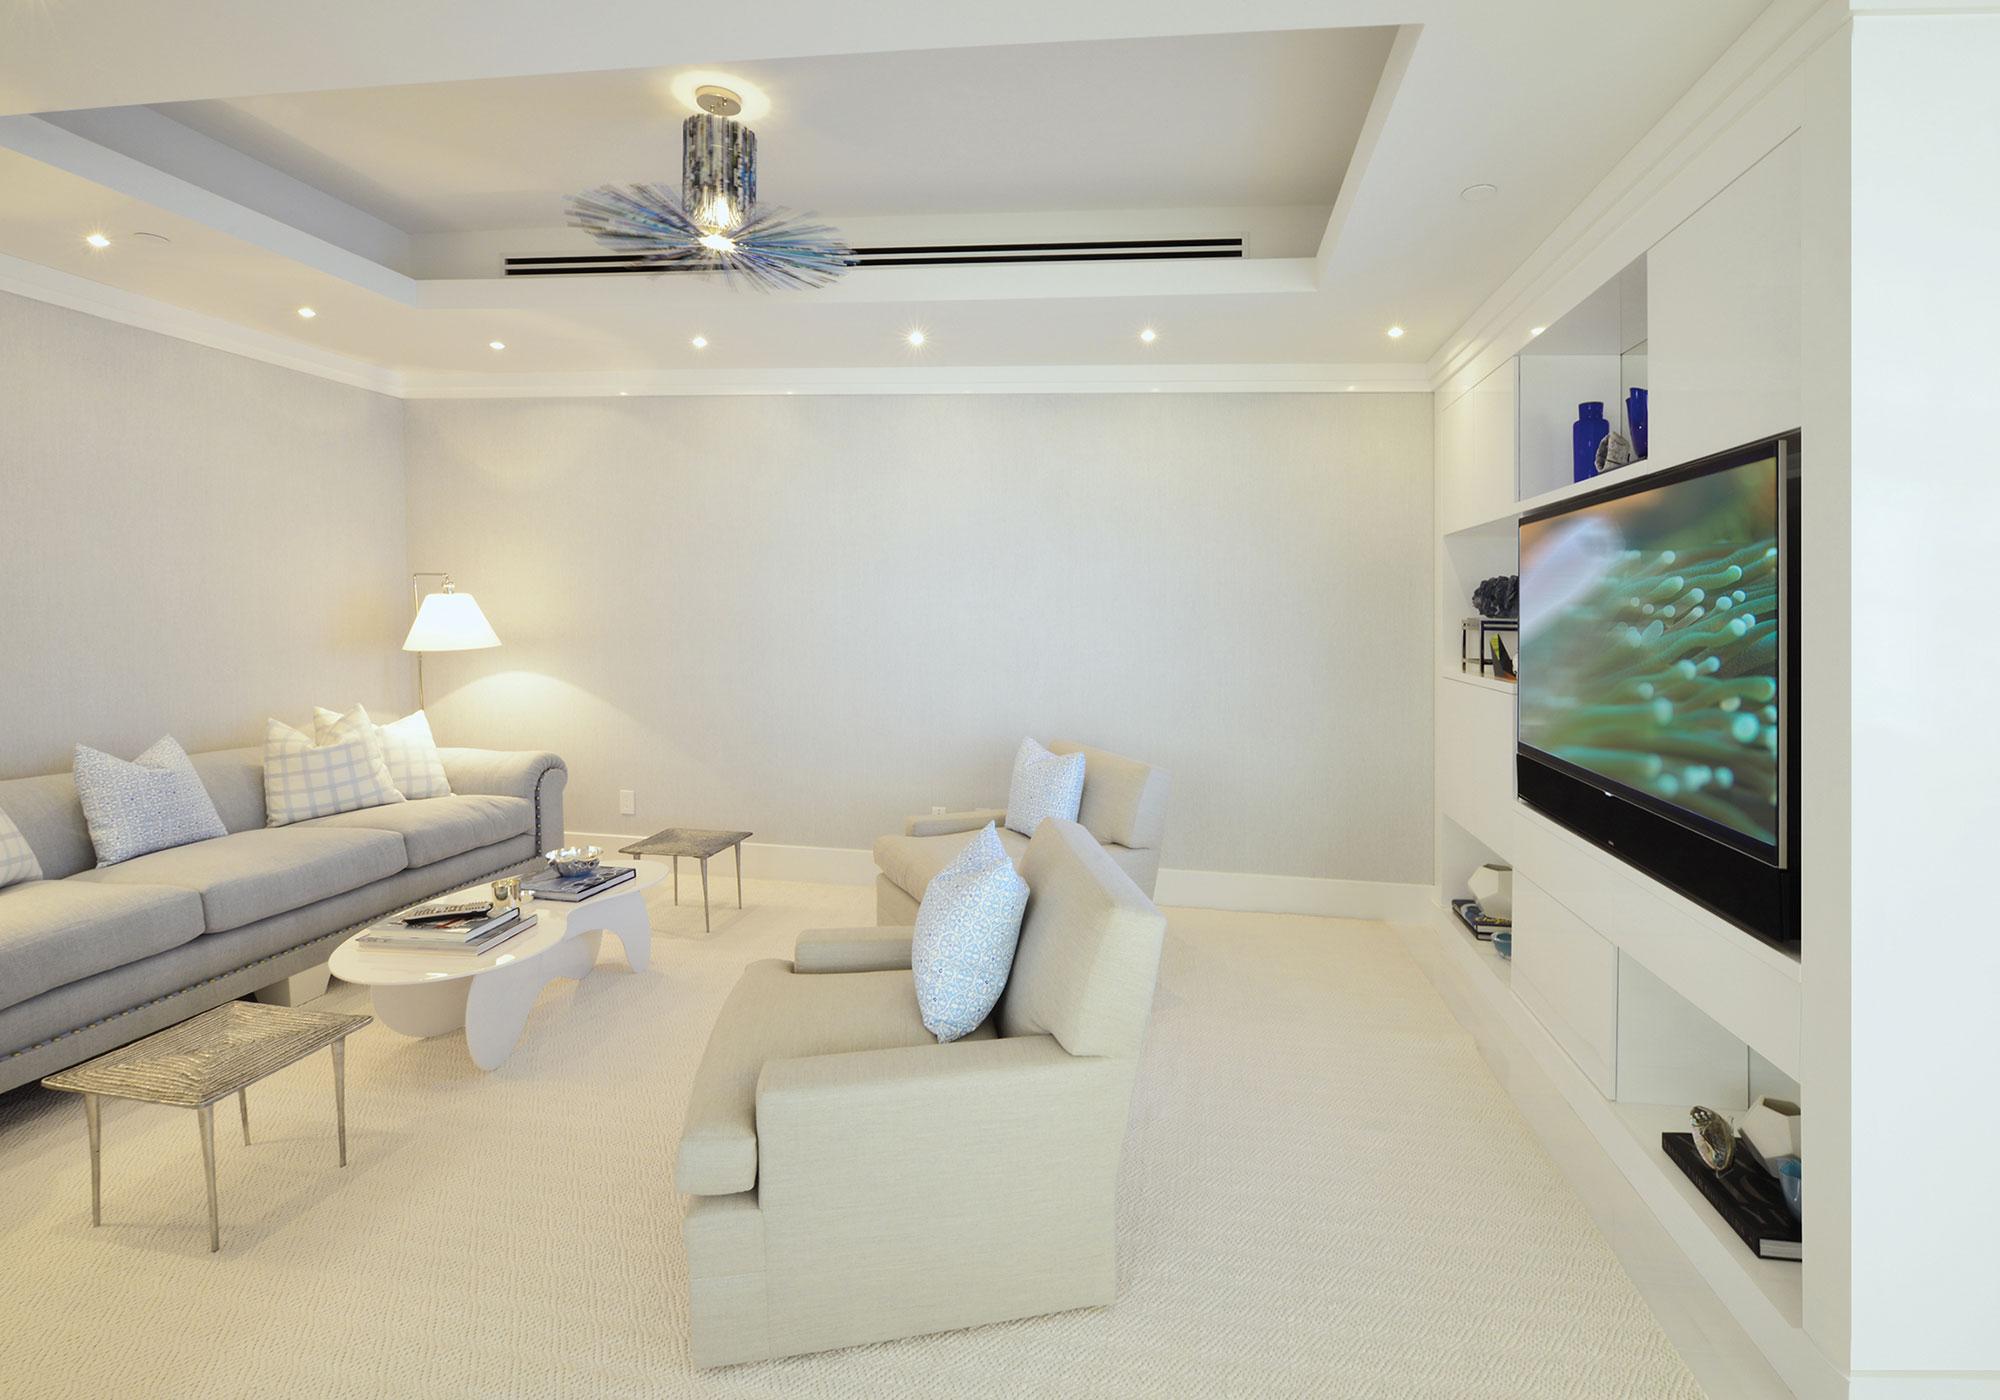 media room, living room, tv, recess, millwork, alcove lighting